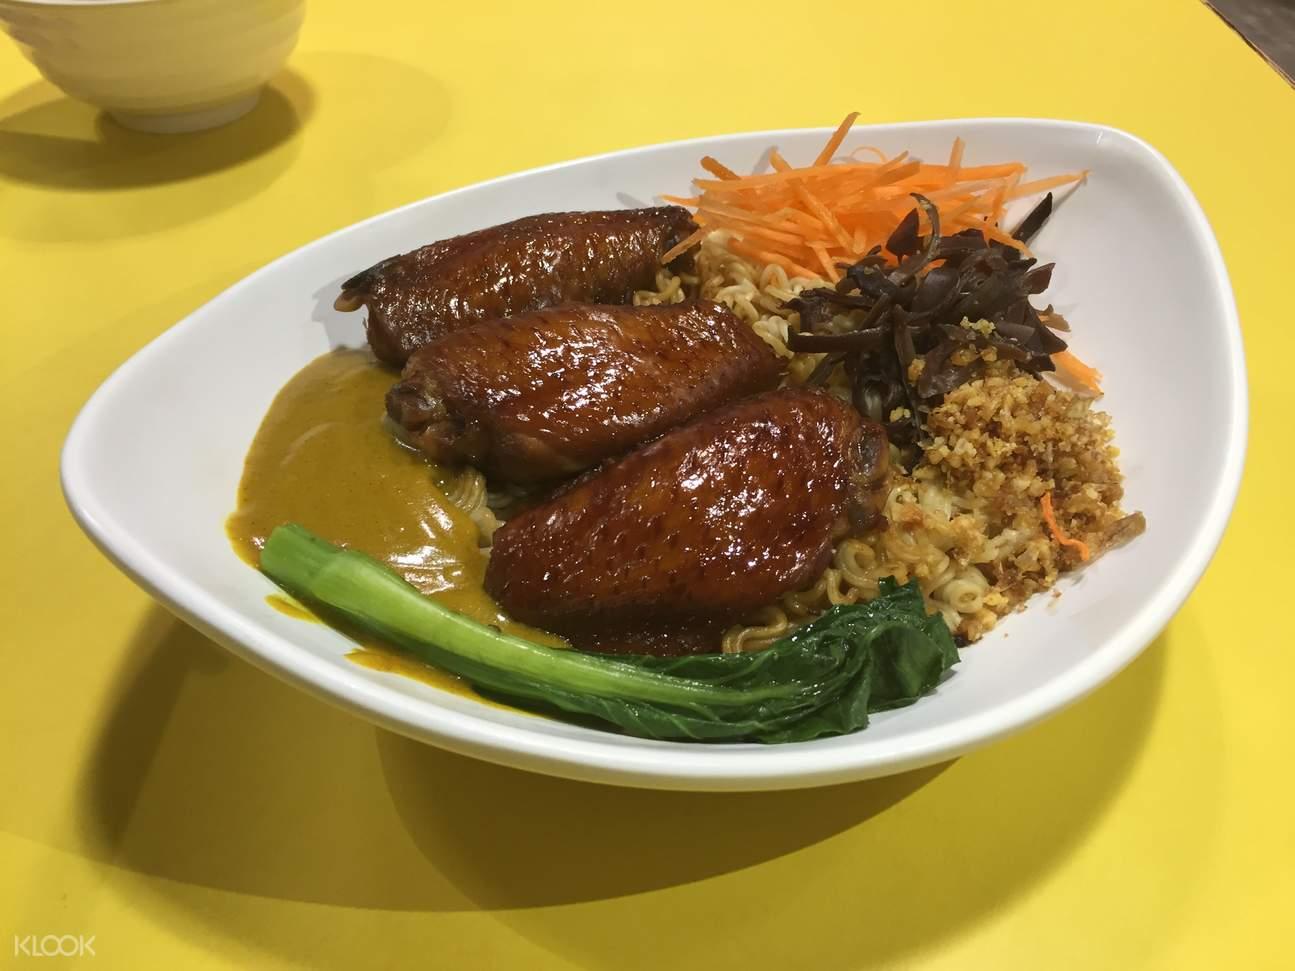 hoi pong chan kee restaurant kennedy town